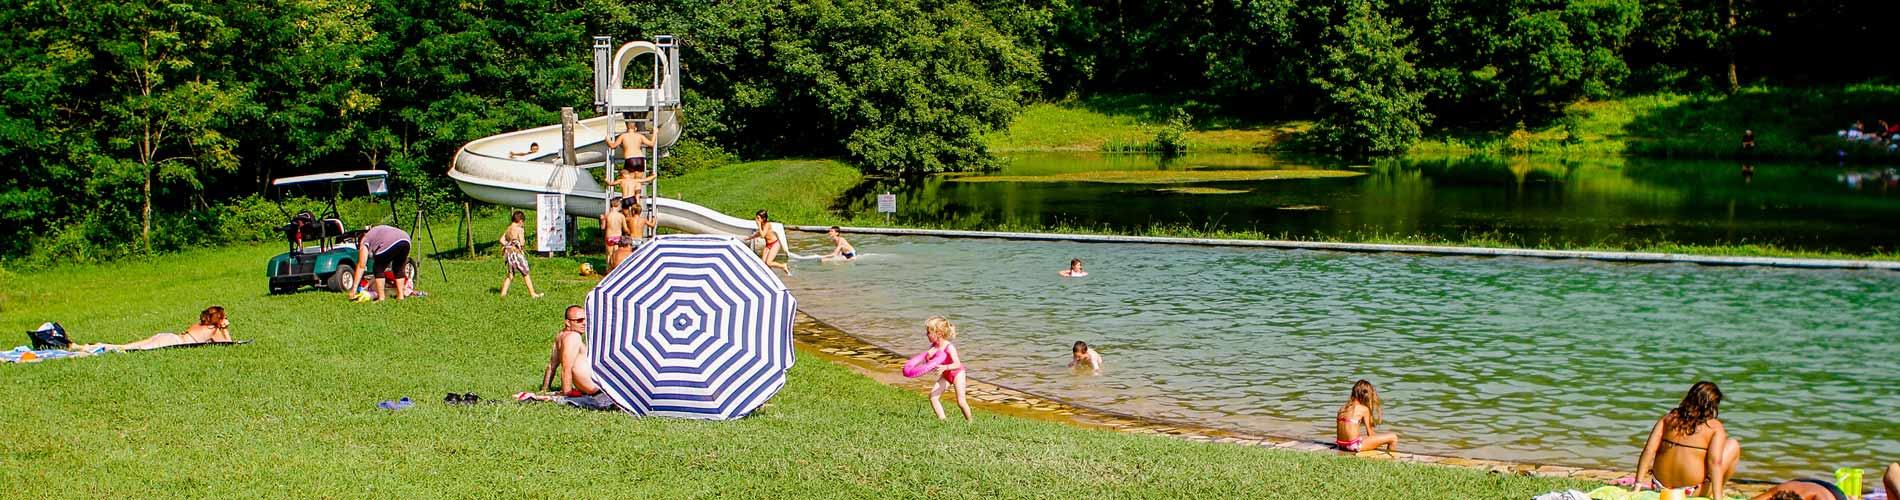 Lac du der camping avec piscine camping jura 4 toiles for Camping les vosges avec piscine